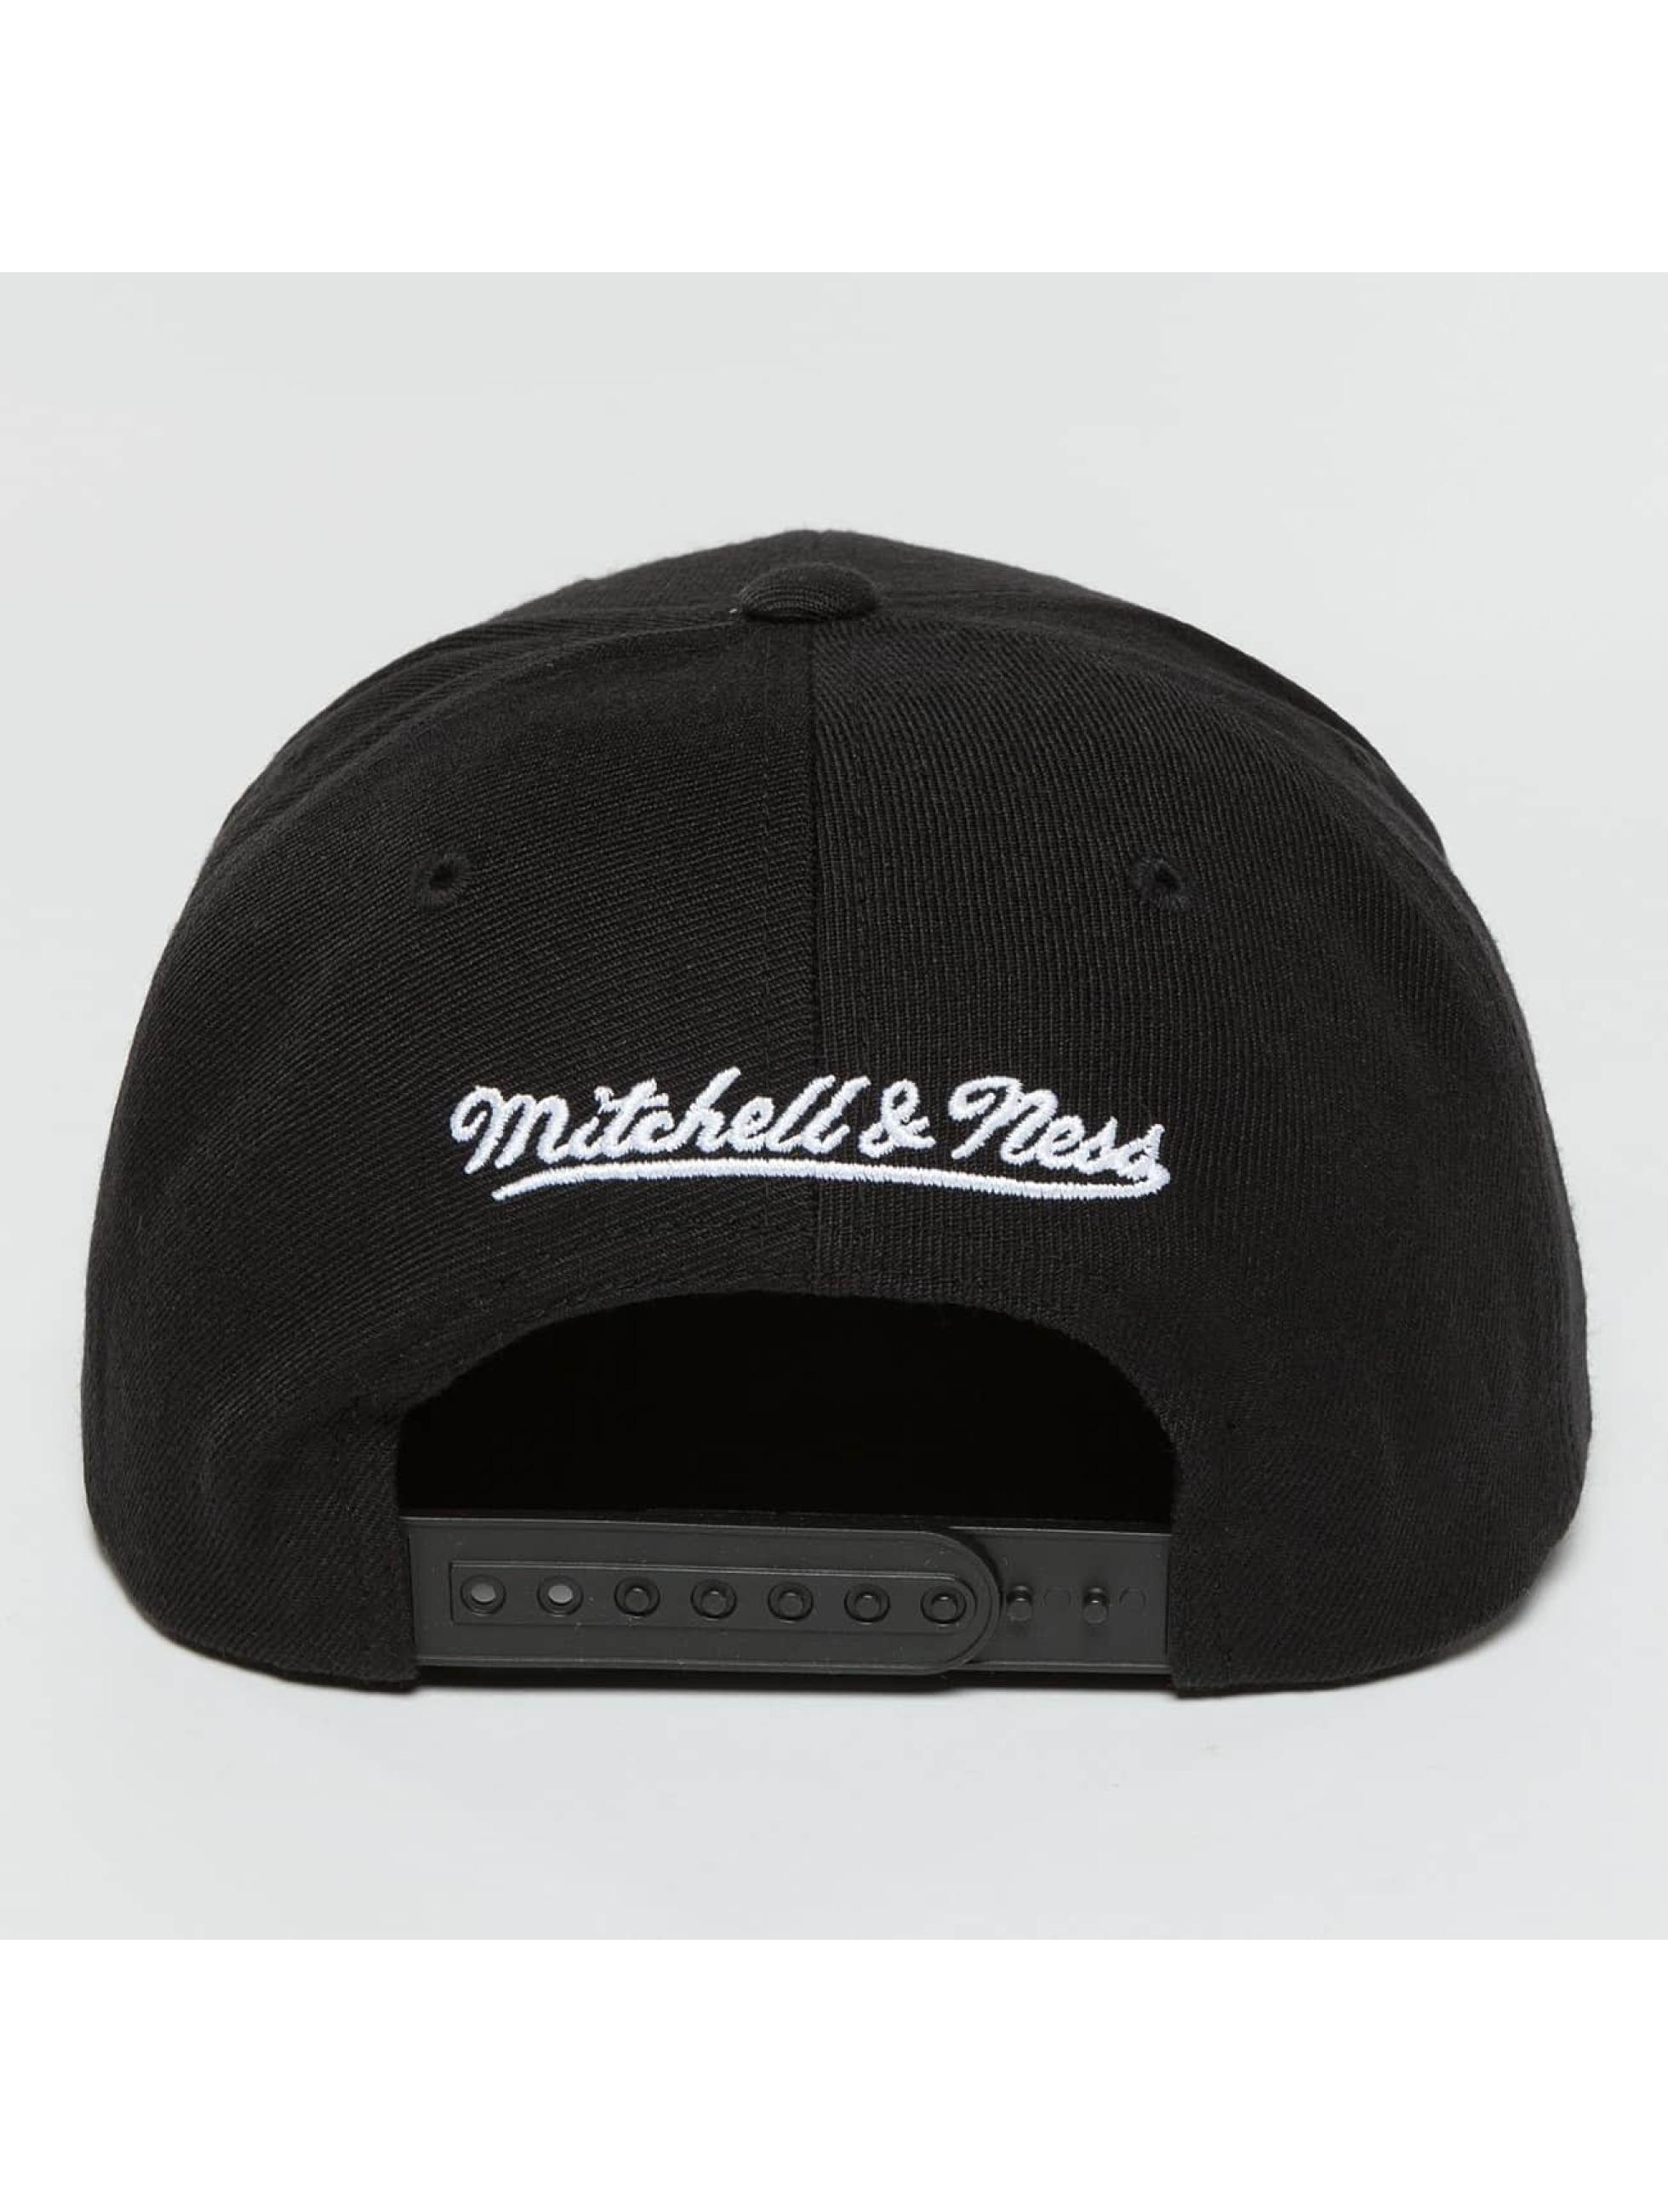 Mitchell & Ness Snapback Cap Full Dollar Golden State Warriors nero